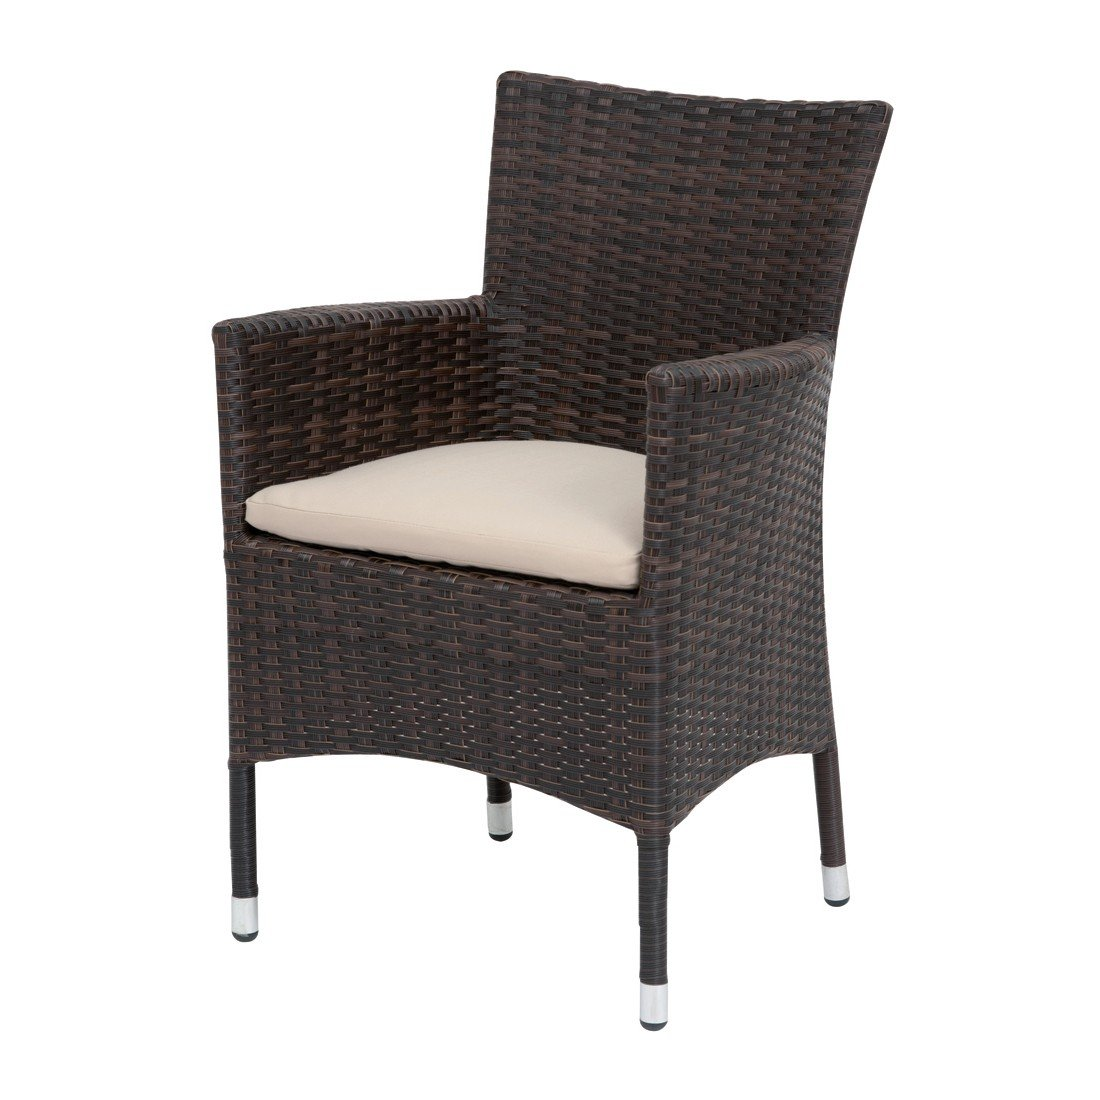 Siena Garden 654838 Sessel Bern, bi-color mocca L 61 x B 60 x H 89 cm günstig online kaufen